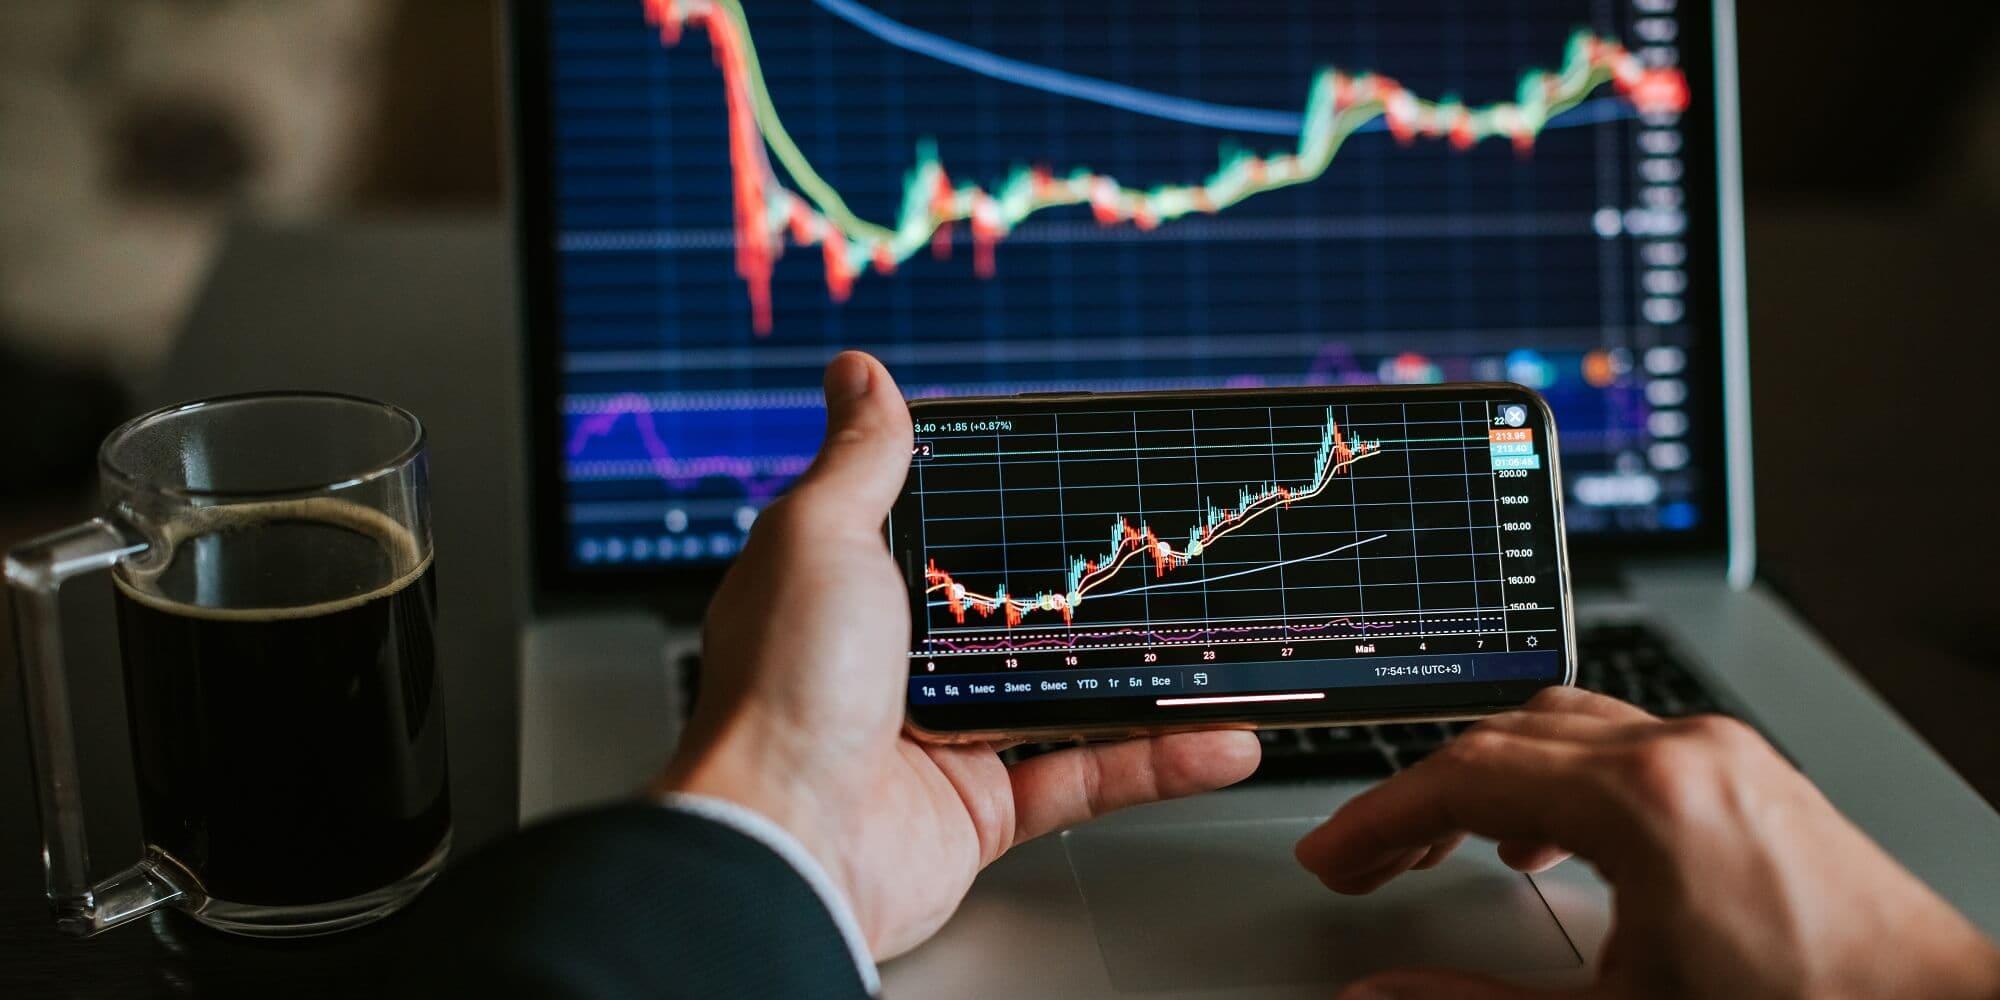 Bitcoin Era - Betrug oder seriöses Investment?